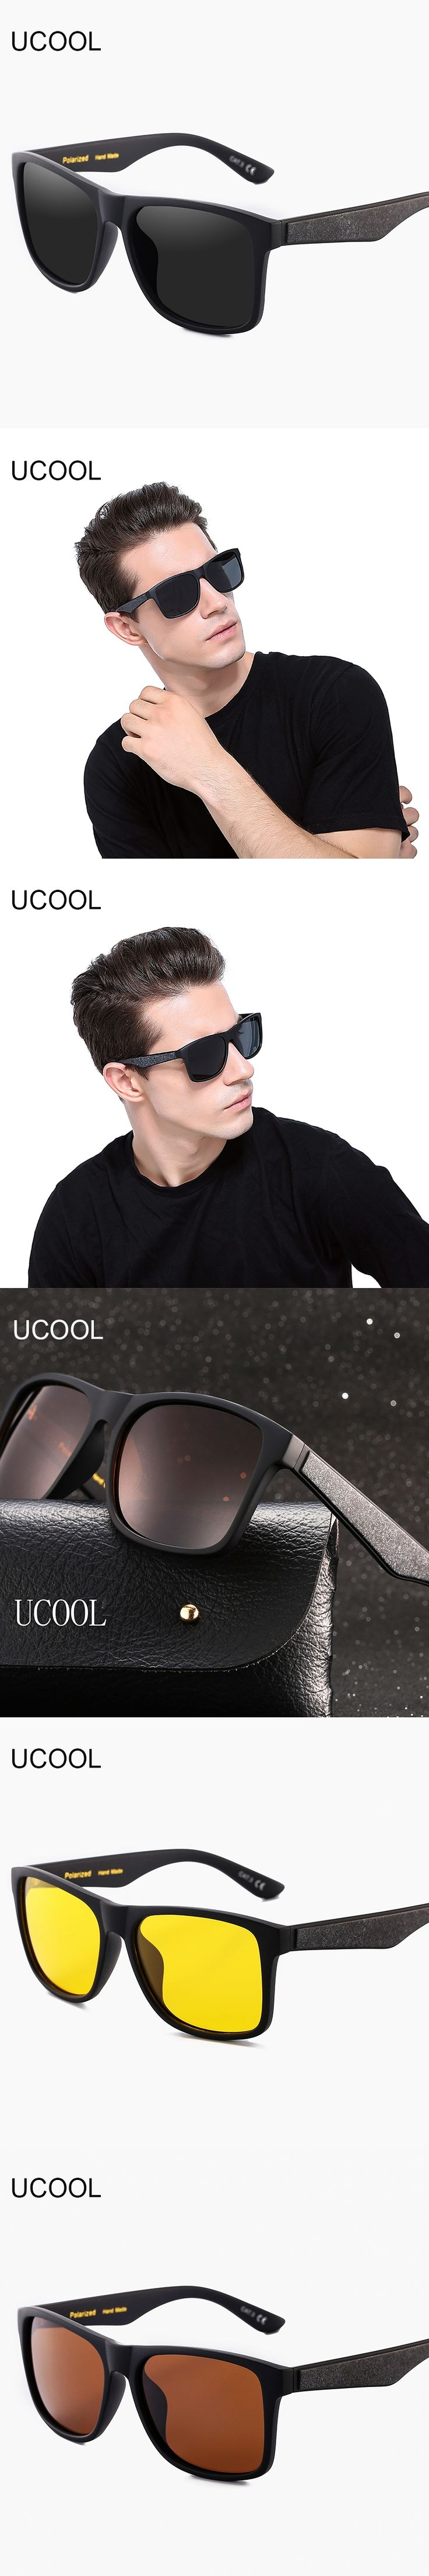 UCOOL Brand New Polarized Sunglasses Men Black Cool Sun Glasses High Quality Fishing Eyewear Oculos Gafas